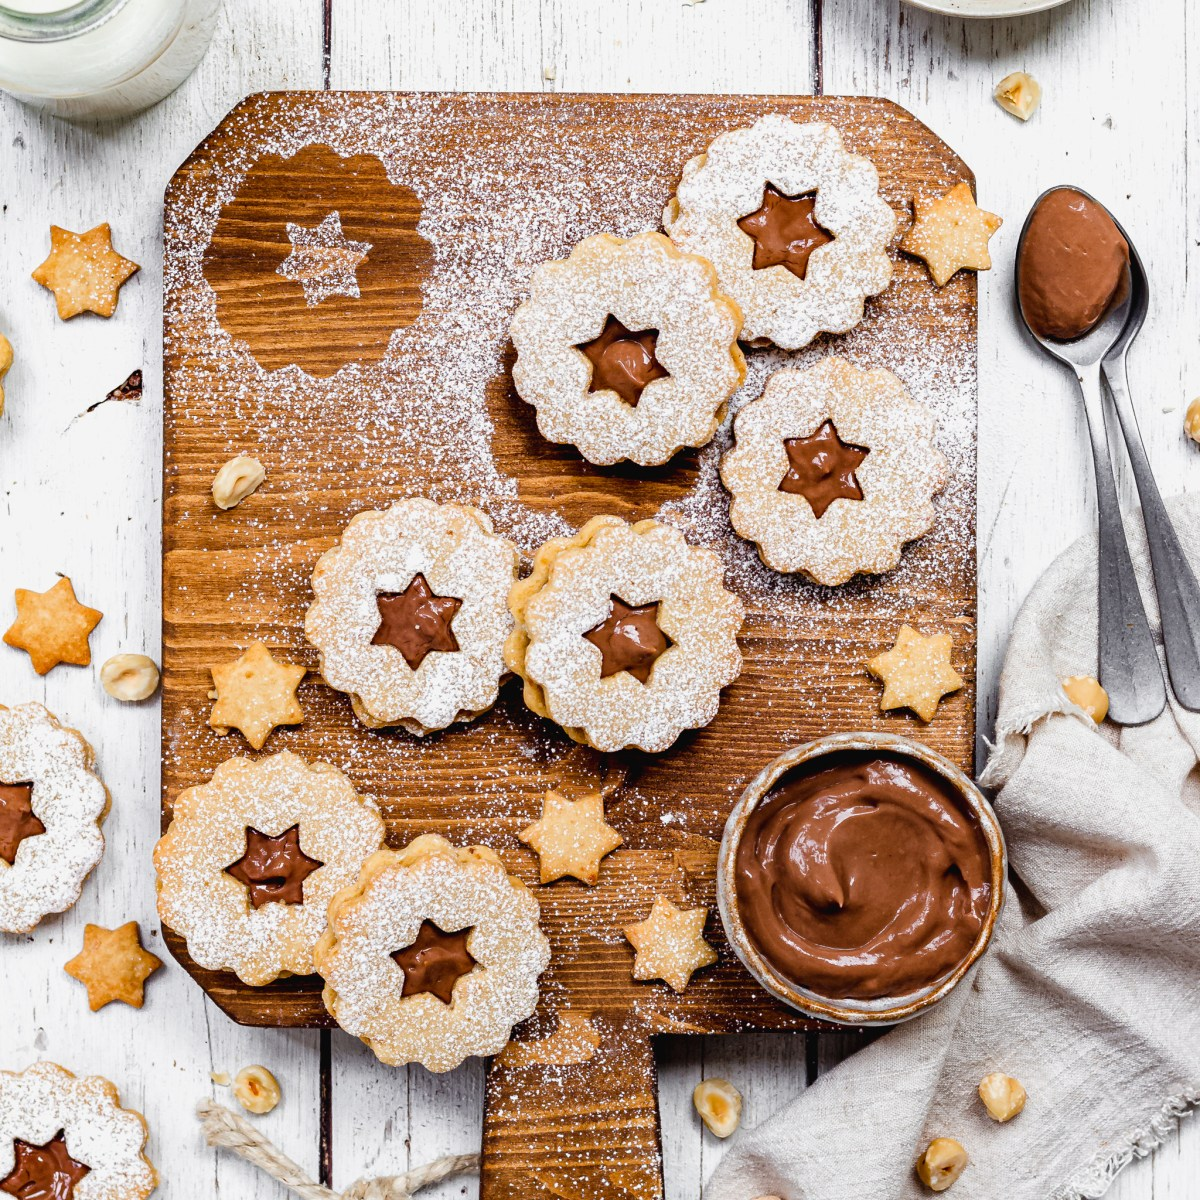 Square photo of Chocolate Hazelnut Linzer Cookies